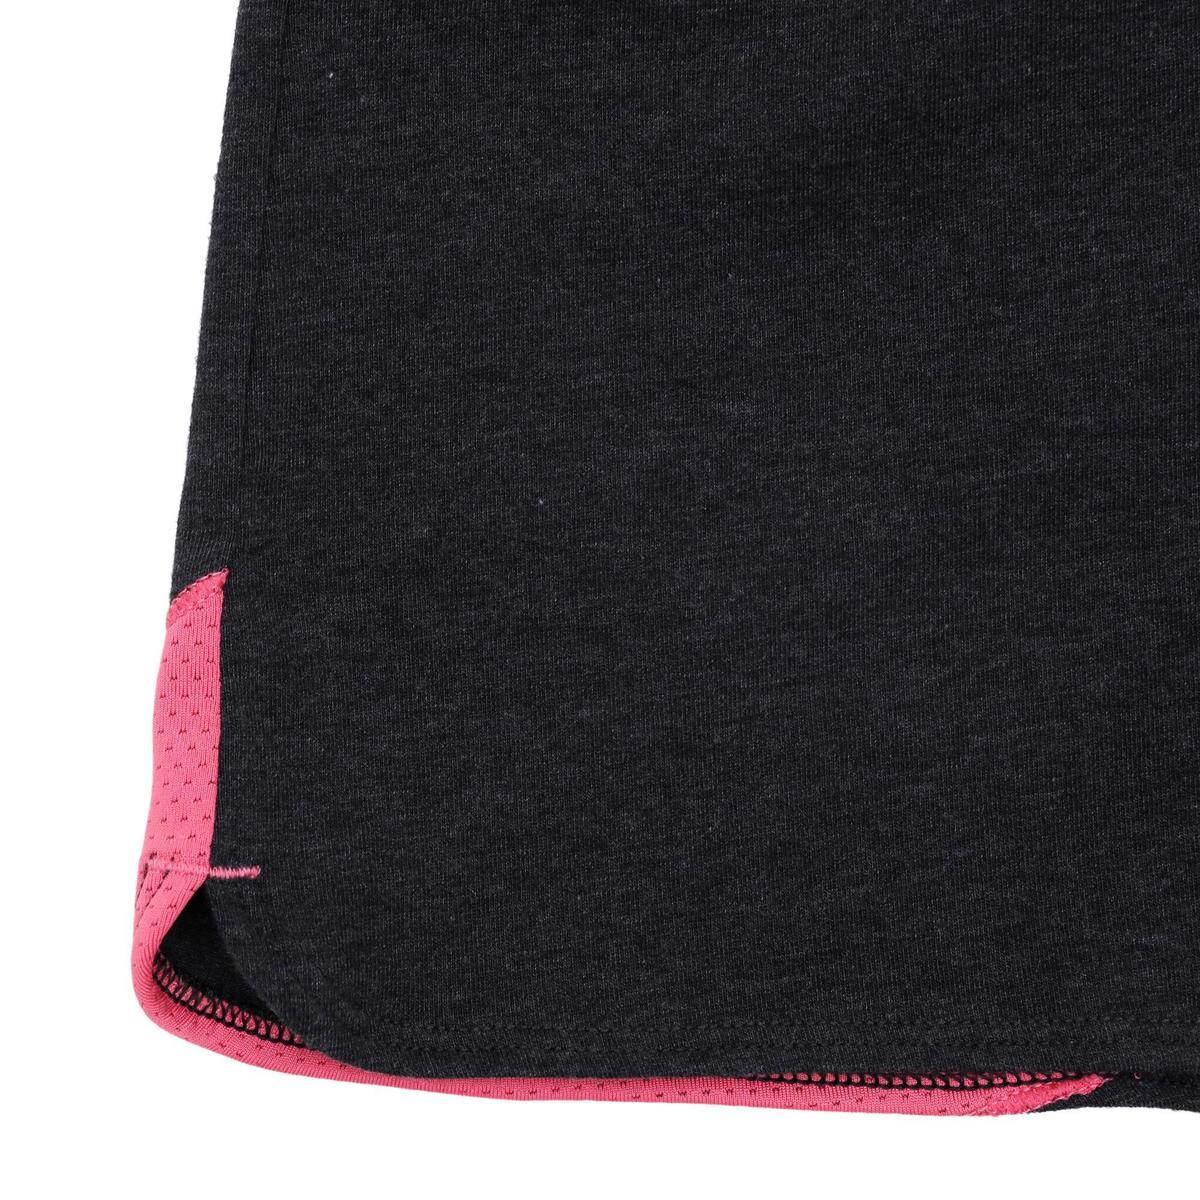 Bild 5 von Sporthose kurz 500 Gym Kinder grau/rosa mit Print